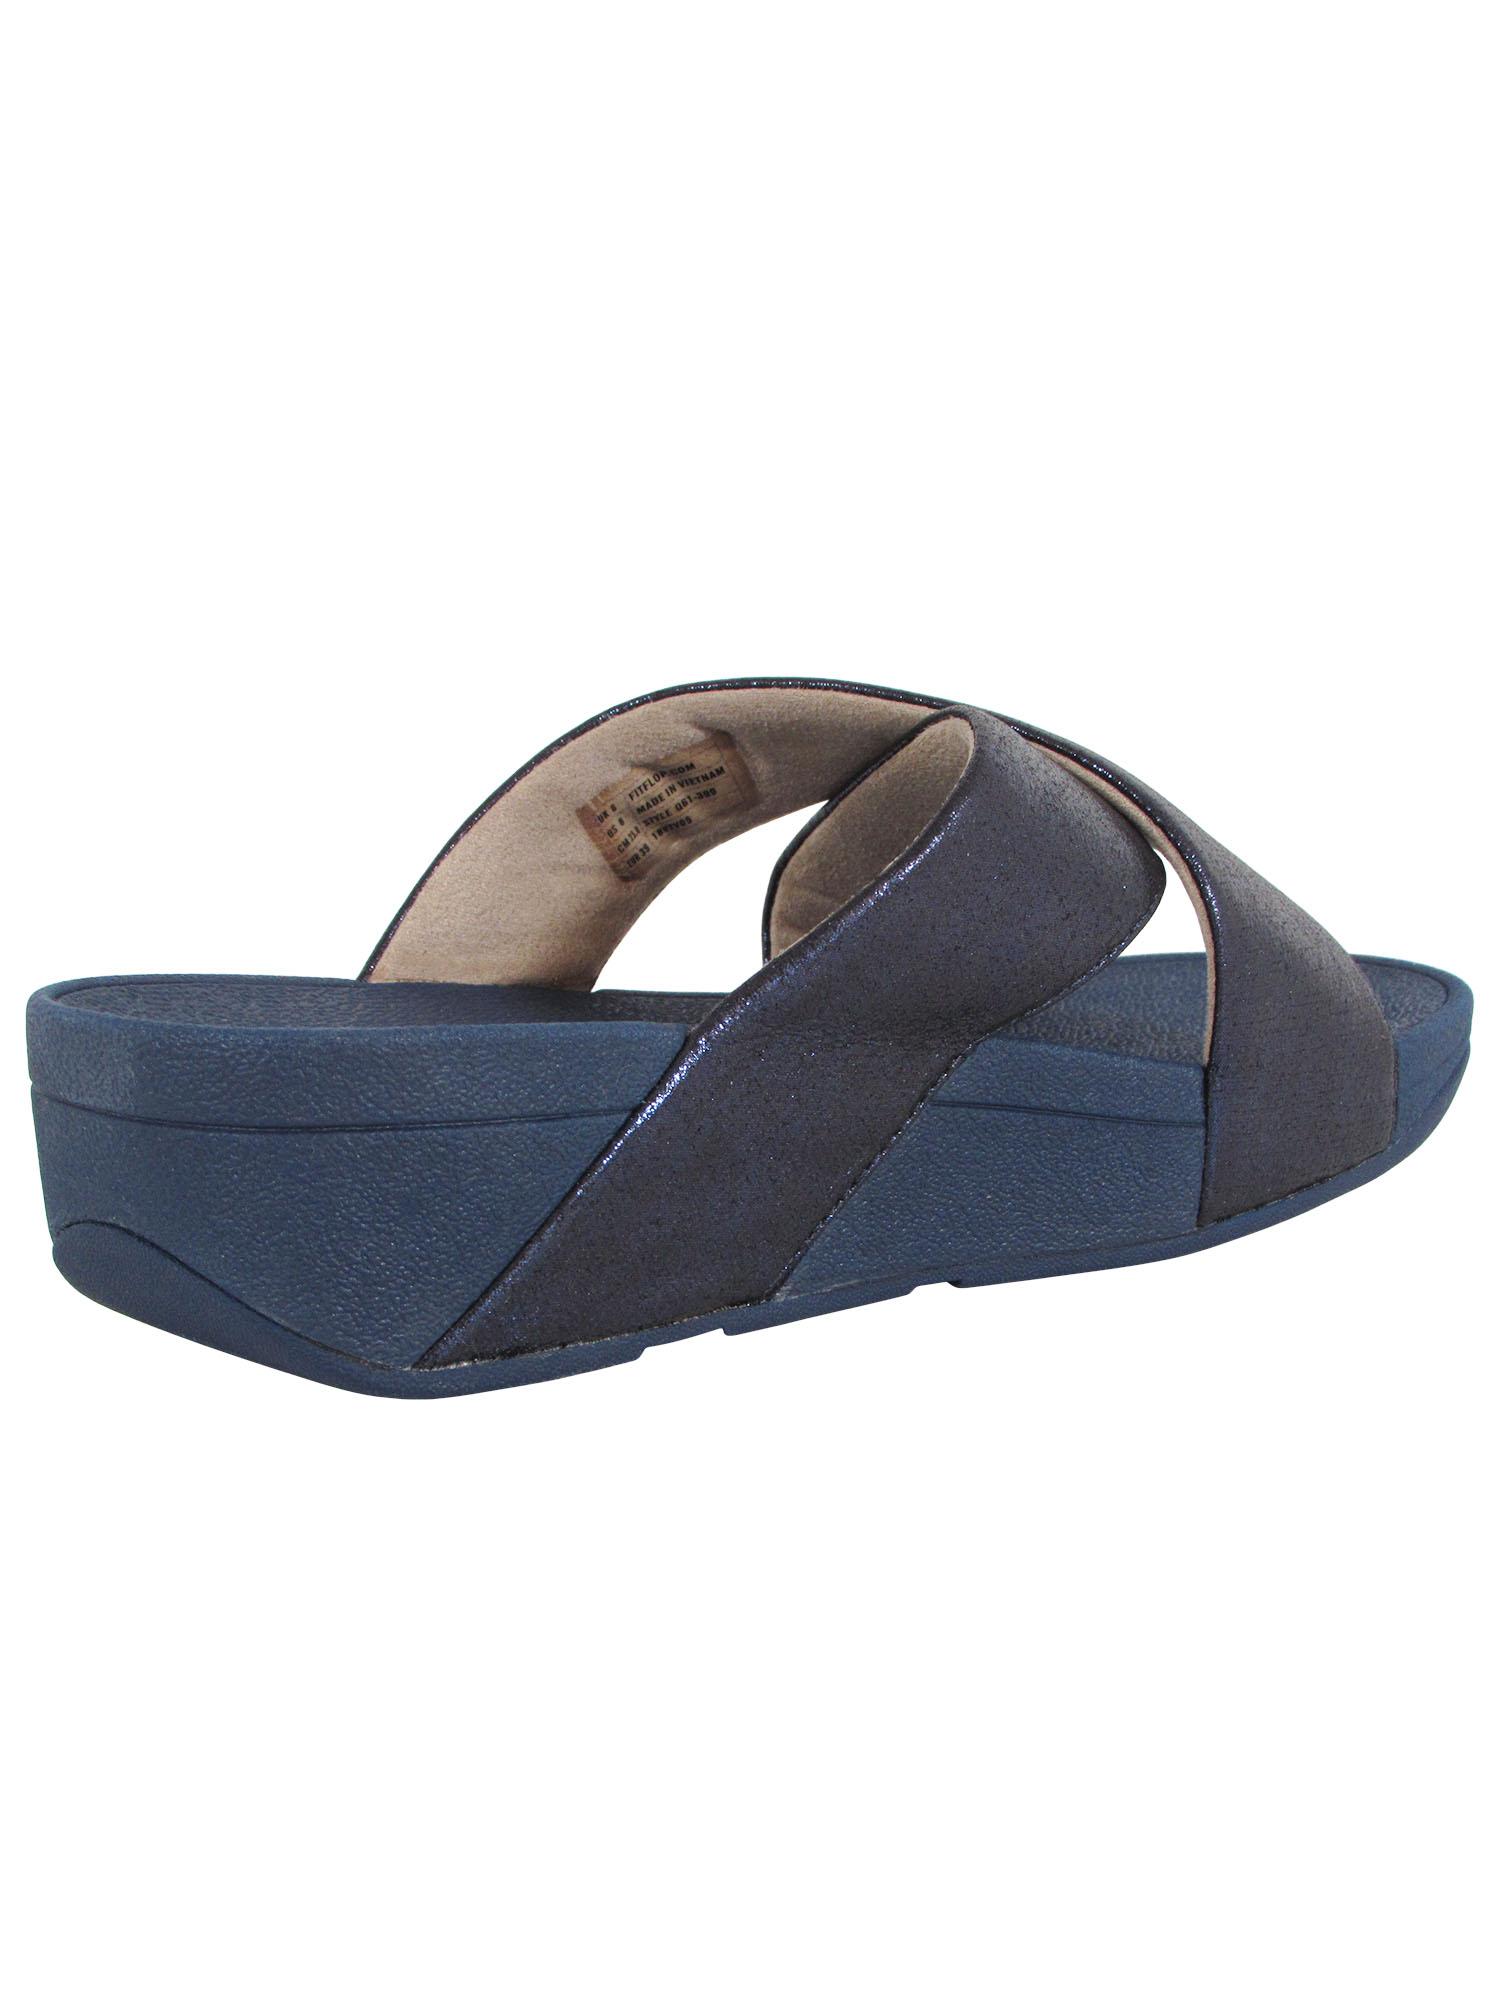 Fitflop-Womens-Lulu-Cross-Glitz-Slide-Sandal-Shoes thumbnail 10